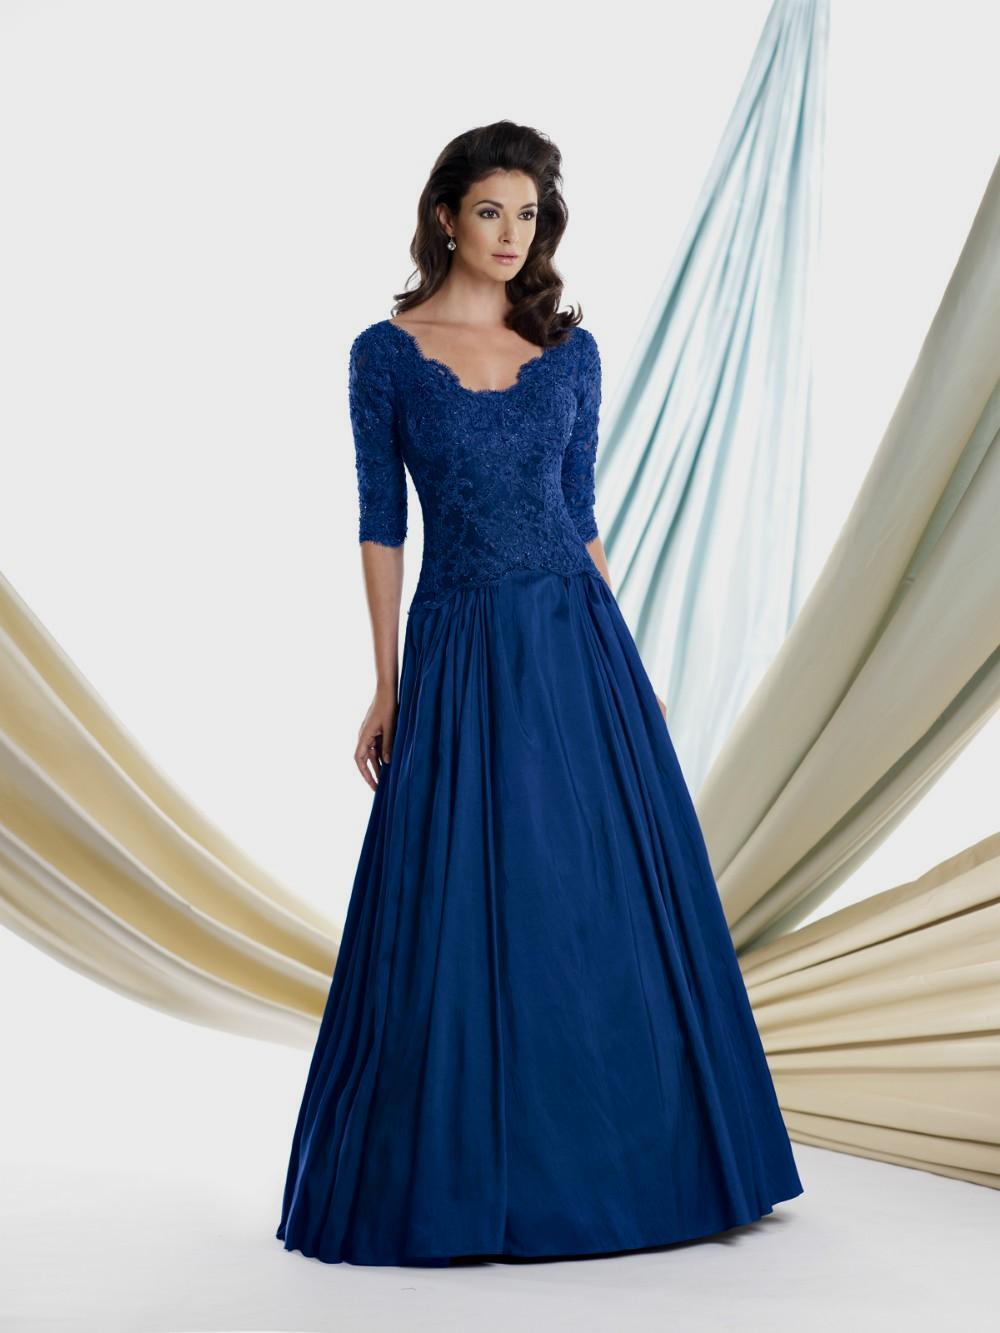 Navy Blue Wedding Dresses Sandiegotowingca Com